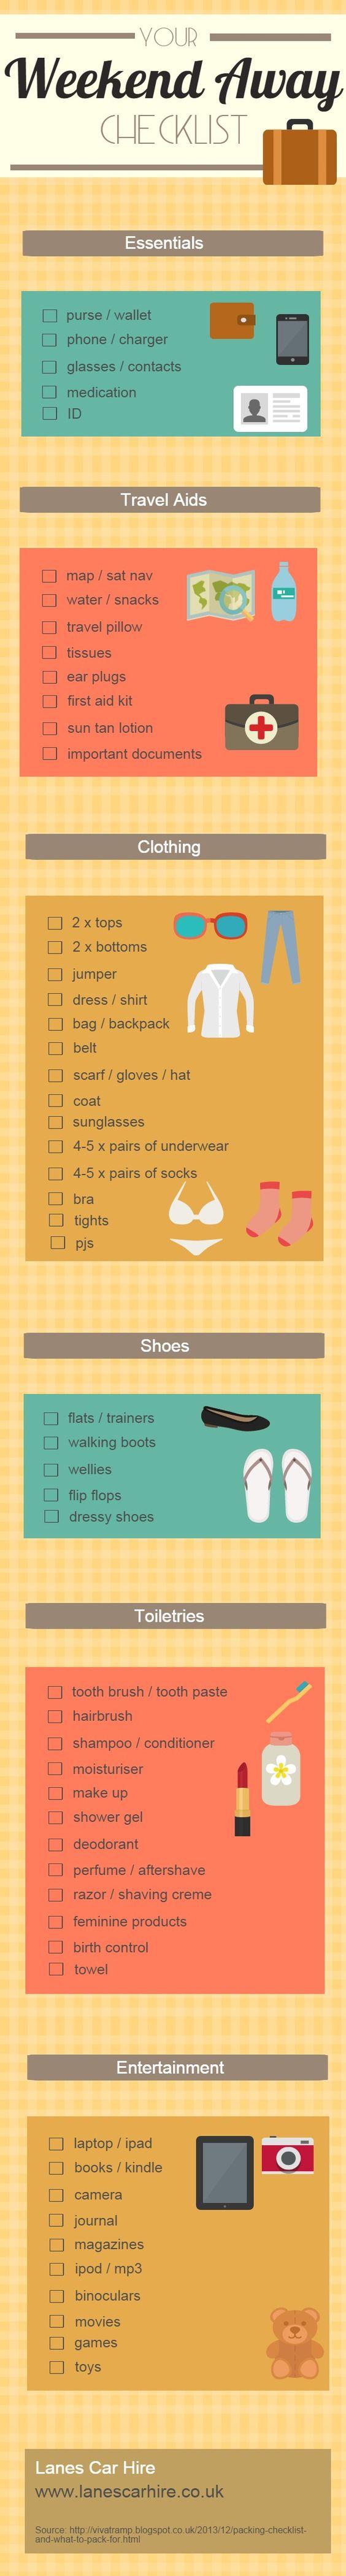 Your Weekend Away Checklist #infographic #Travel #CheckList